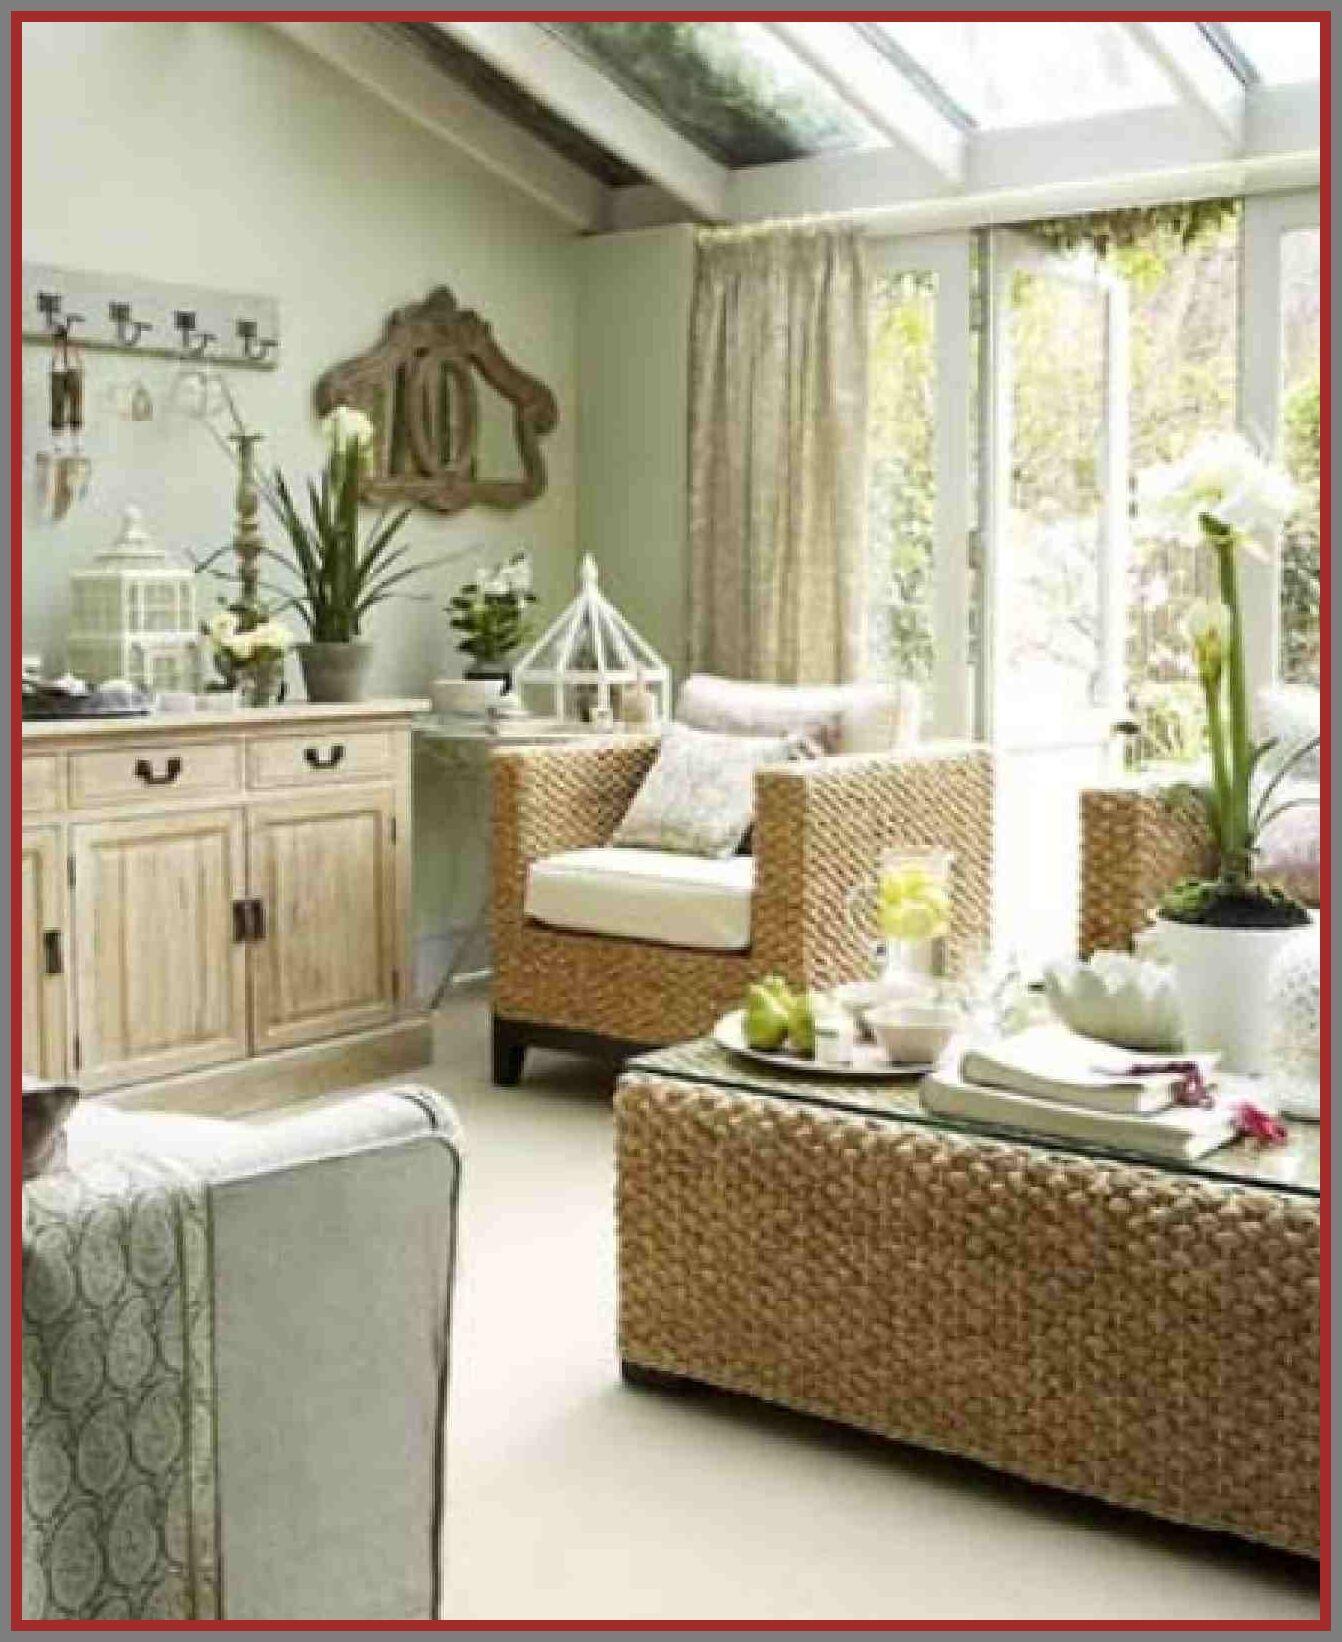 51 Reference Of Light Green Wallpaper For Living Room In 2020 Sage Green Living Room Light Green Bedrooms Grey Paint Living Room #sage #green #living #room #ideas